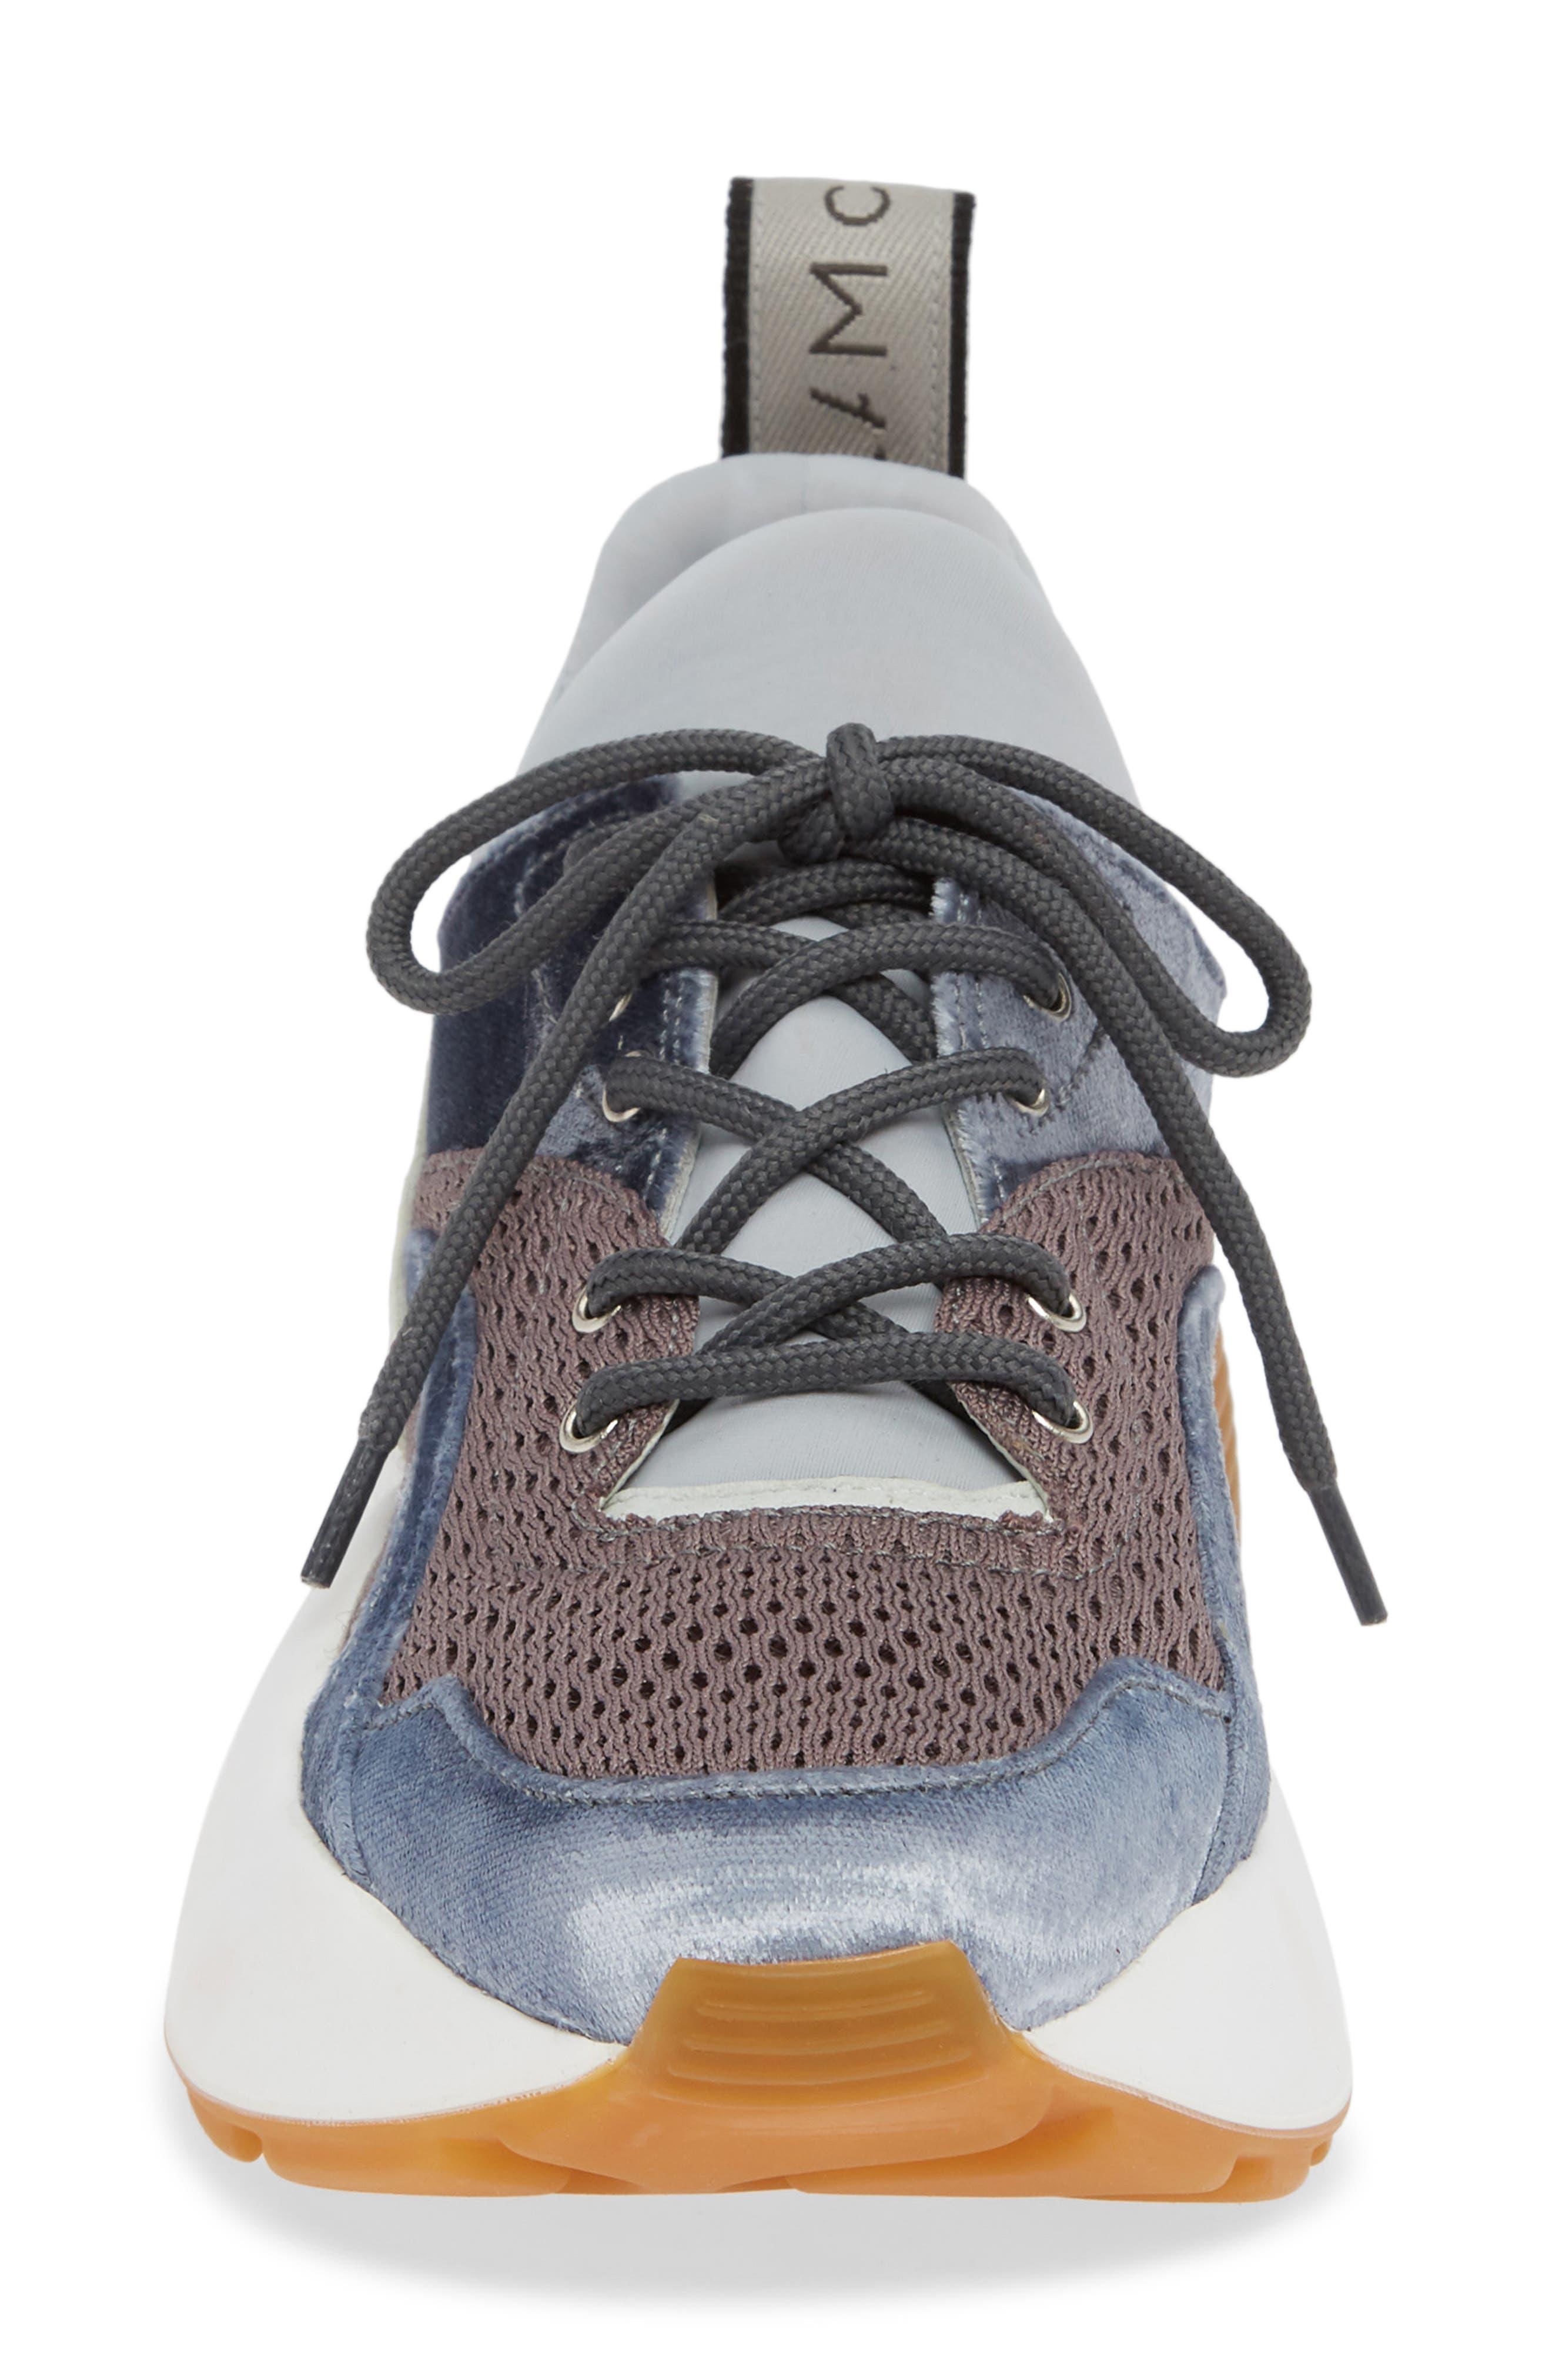 Eclypse Lace-Up Sneaker,                             Alternate thumbnail 4, color,                             GREY/ SILVER/ WHITE